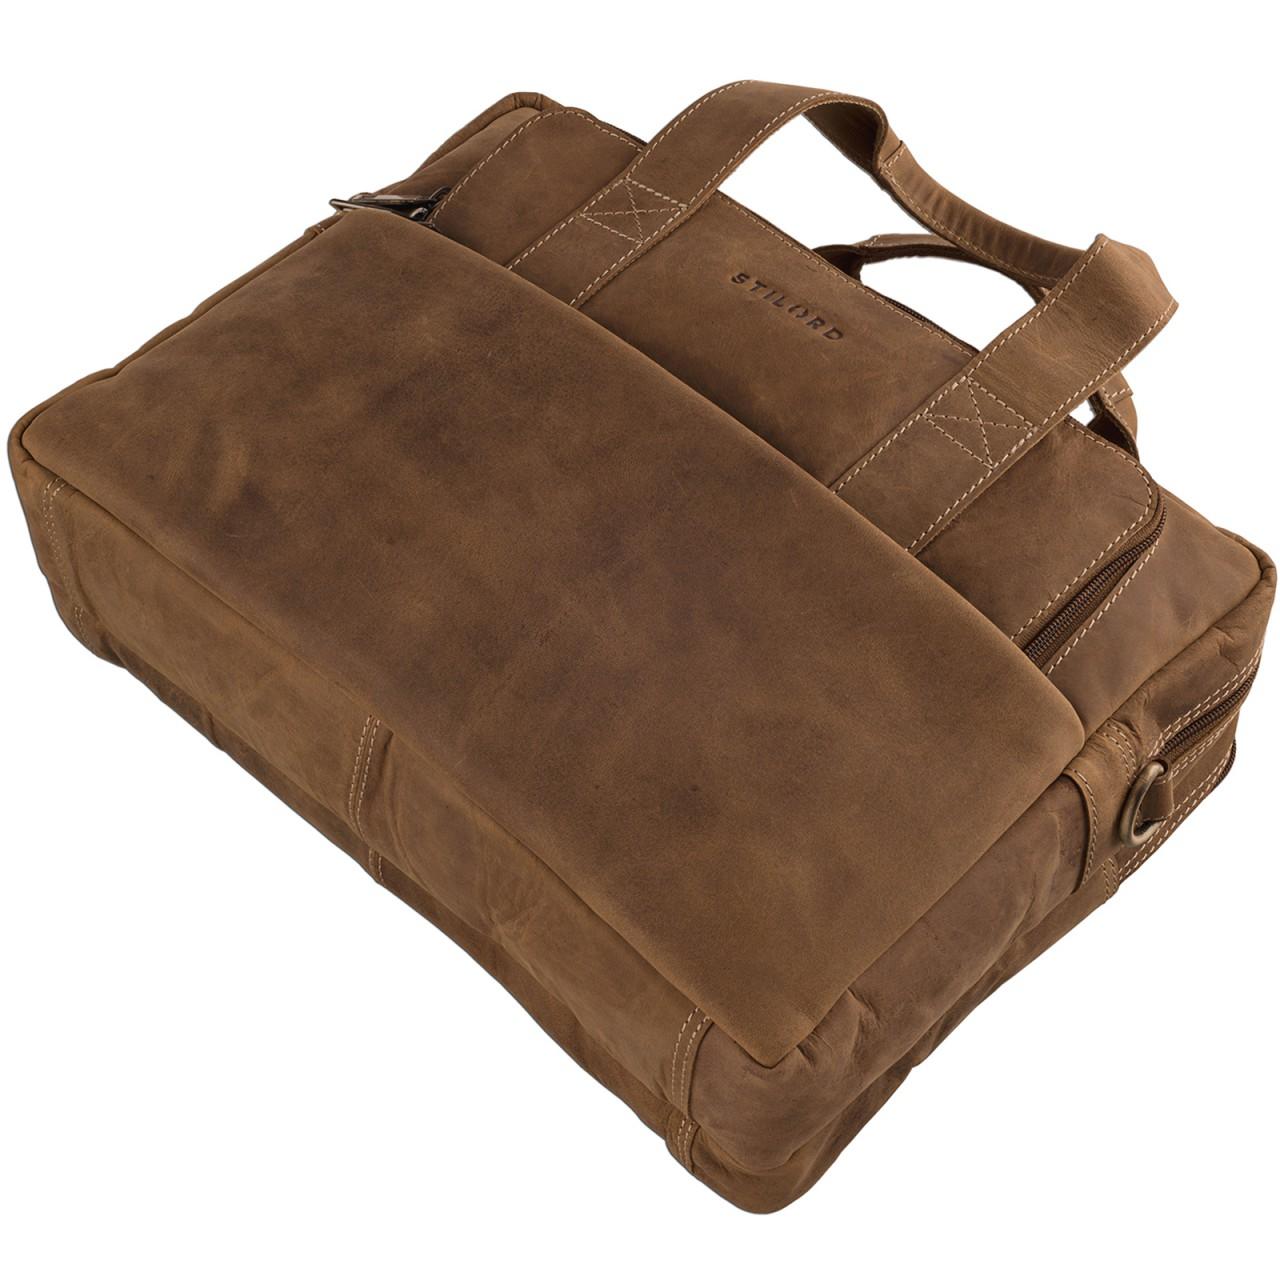 STILORD Vintage Herren Umhängetasche Leder groß Ledertasche Büro Business Studium Uni Lehrertasche Tabletfach 12 Zoll echtes Rinds Leder Braun - Bild 3